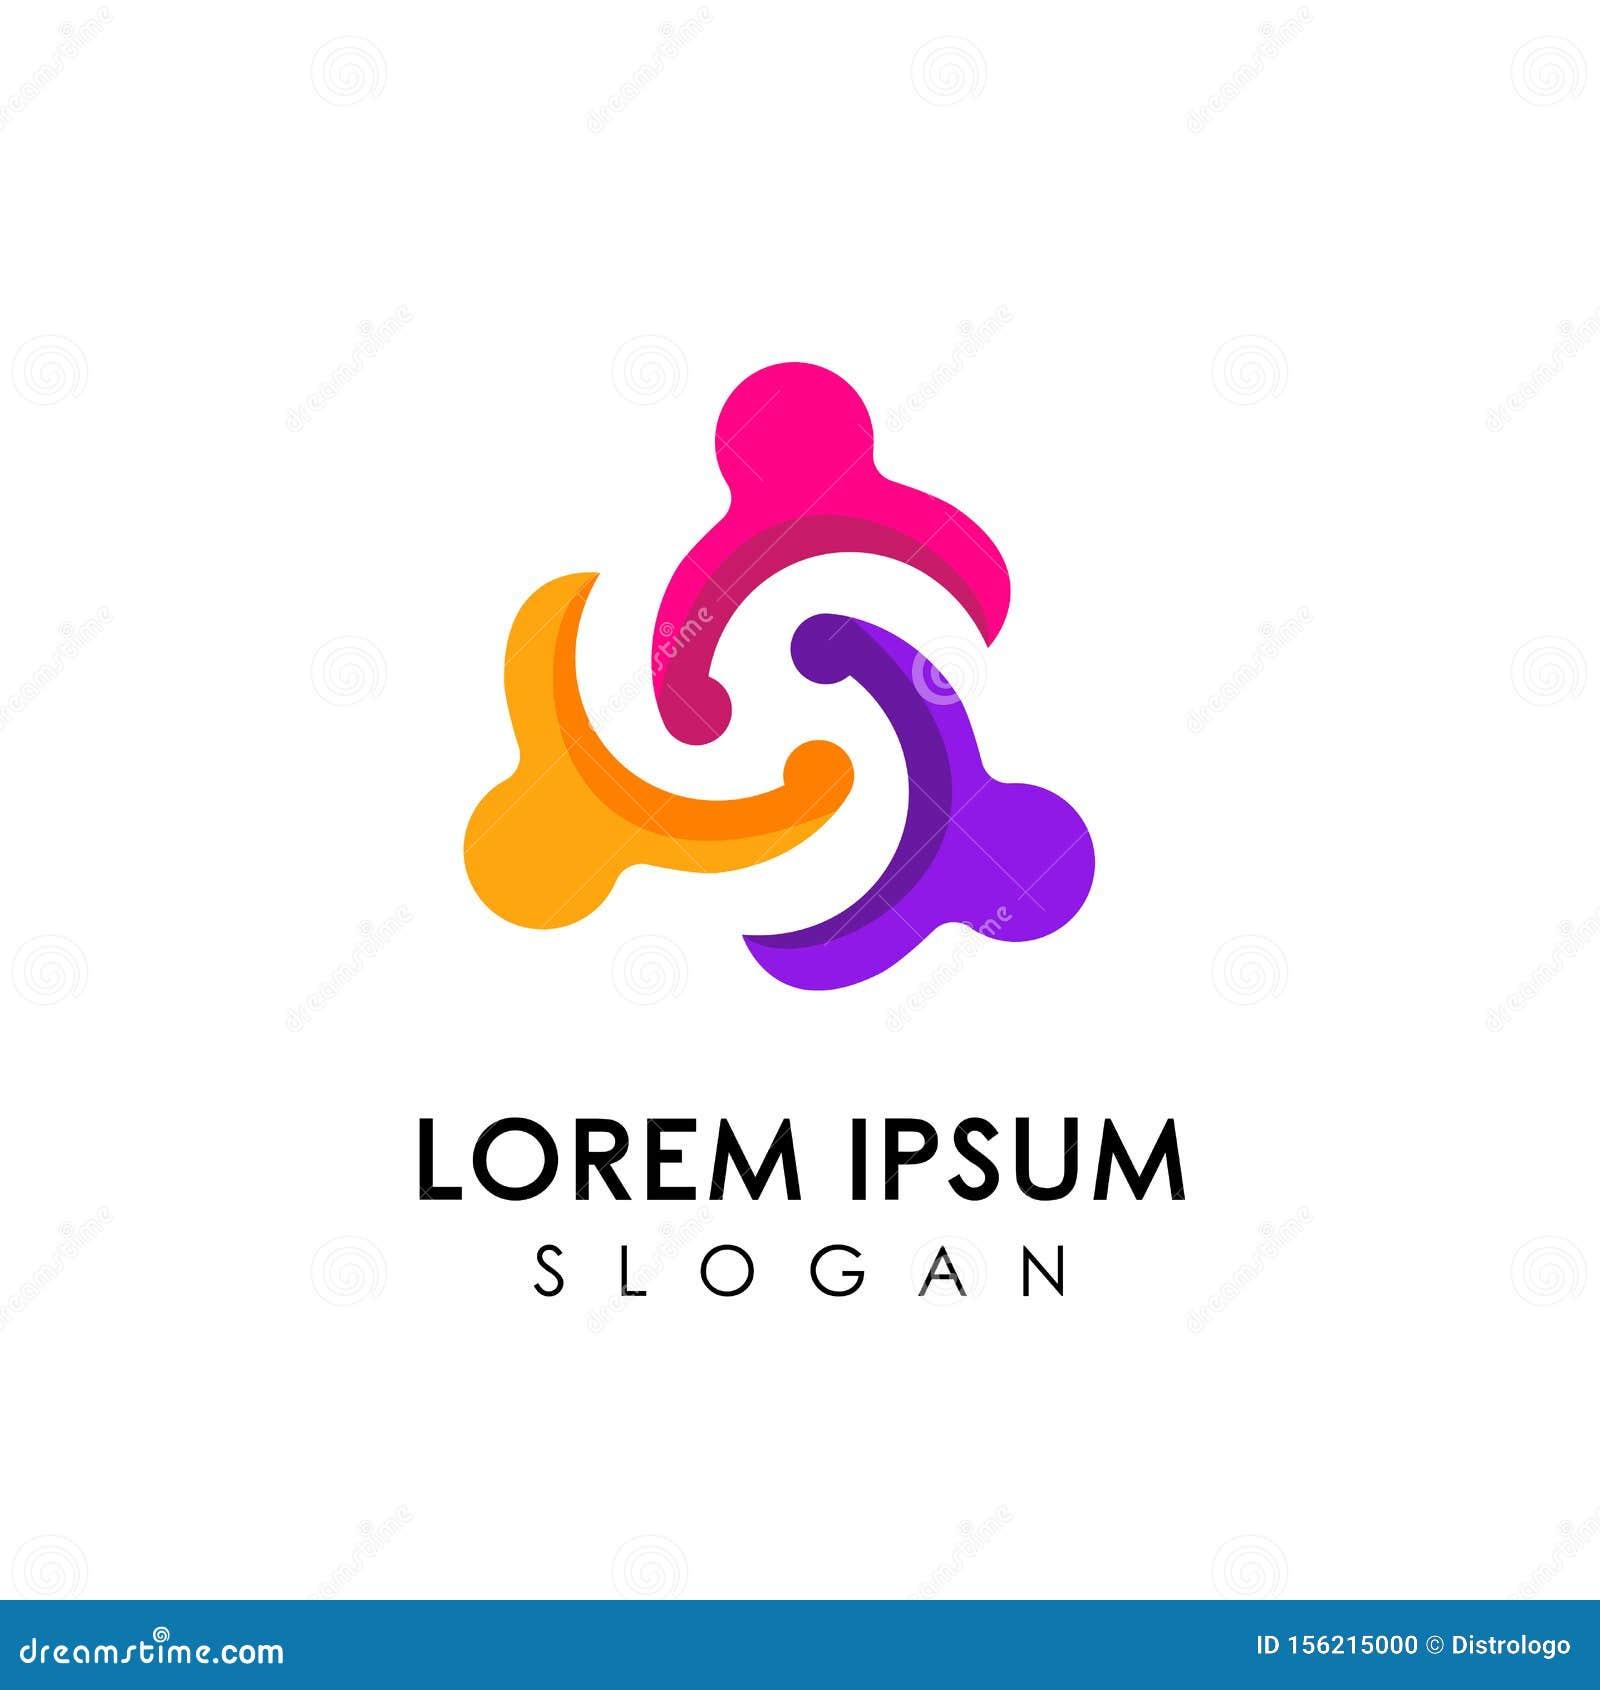 Teamwork And Community Logo Design Vector. Adoption And